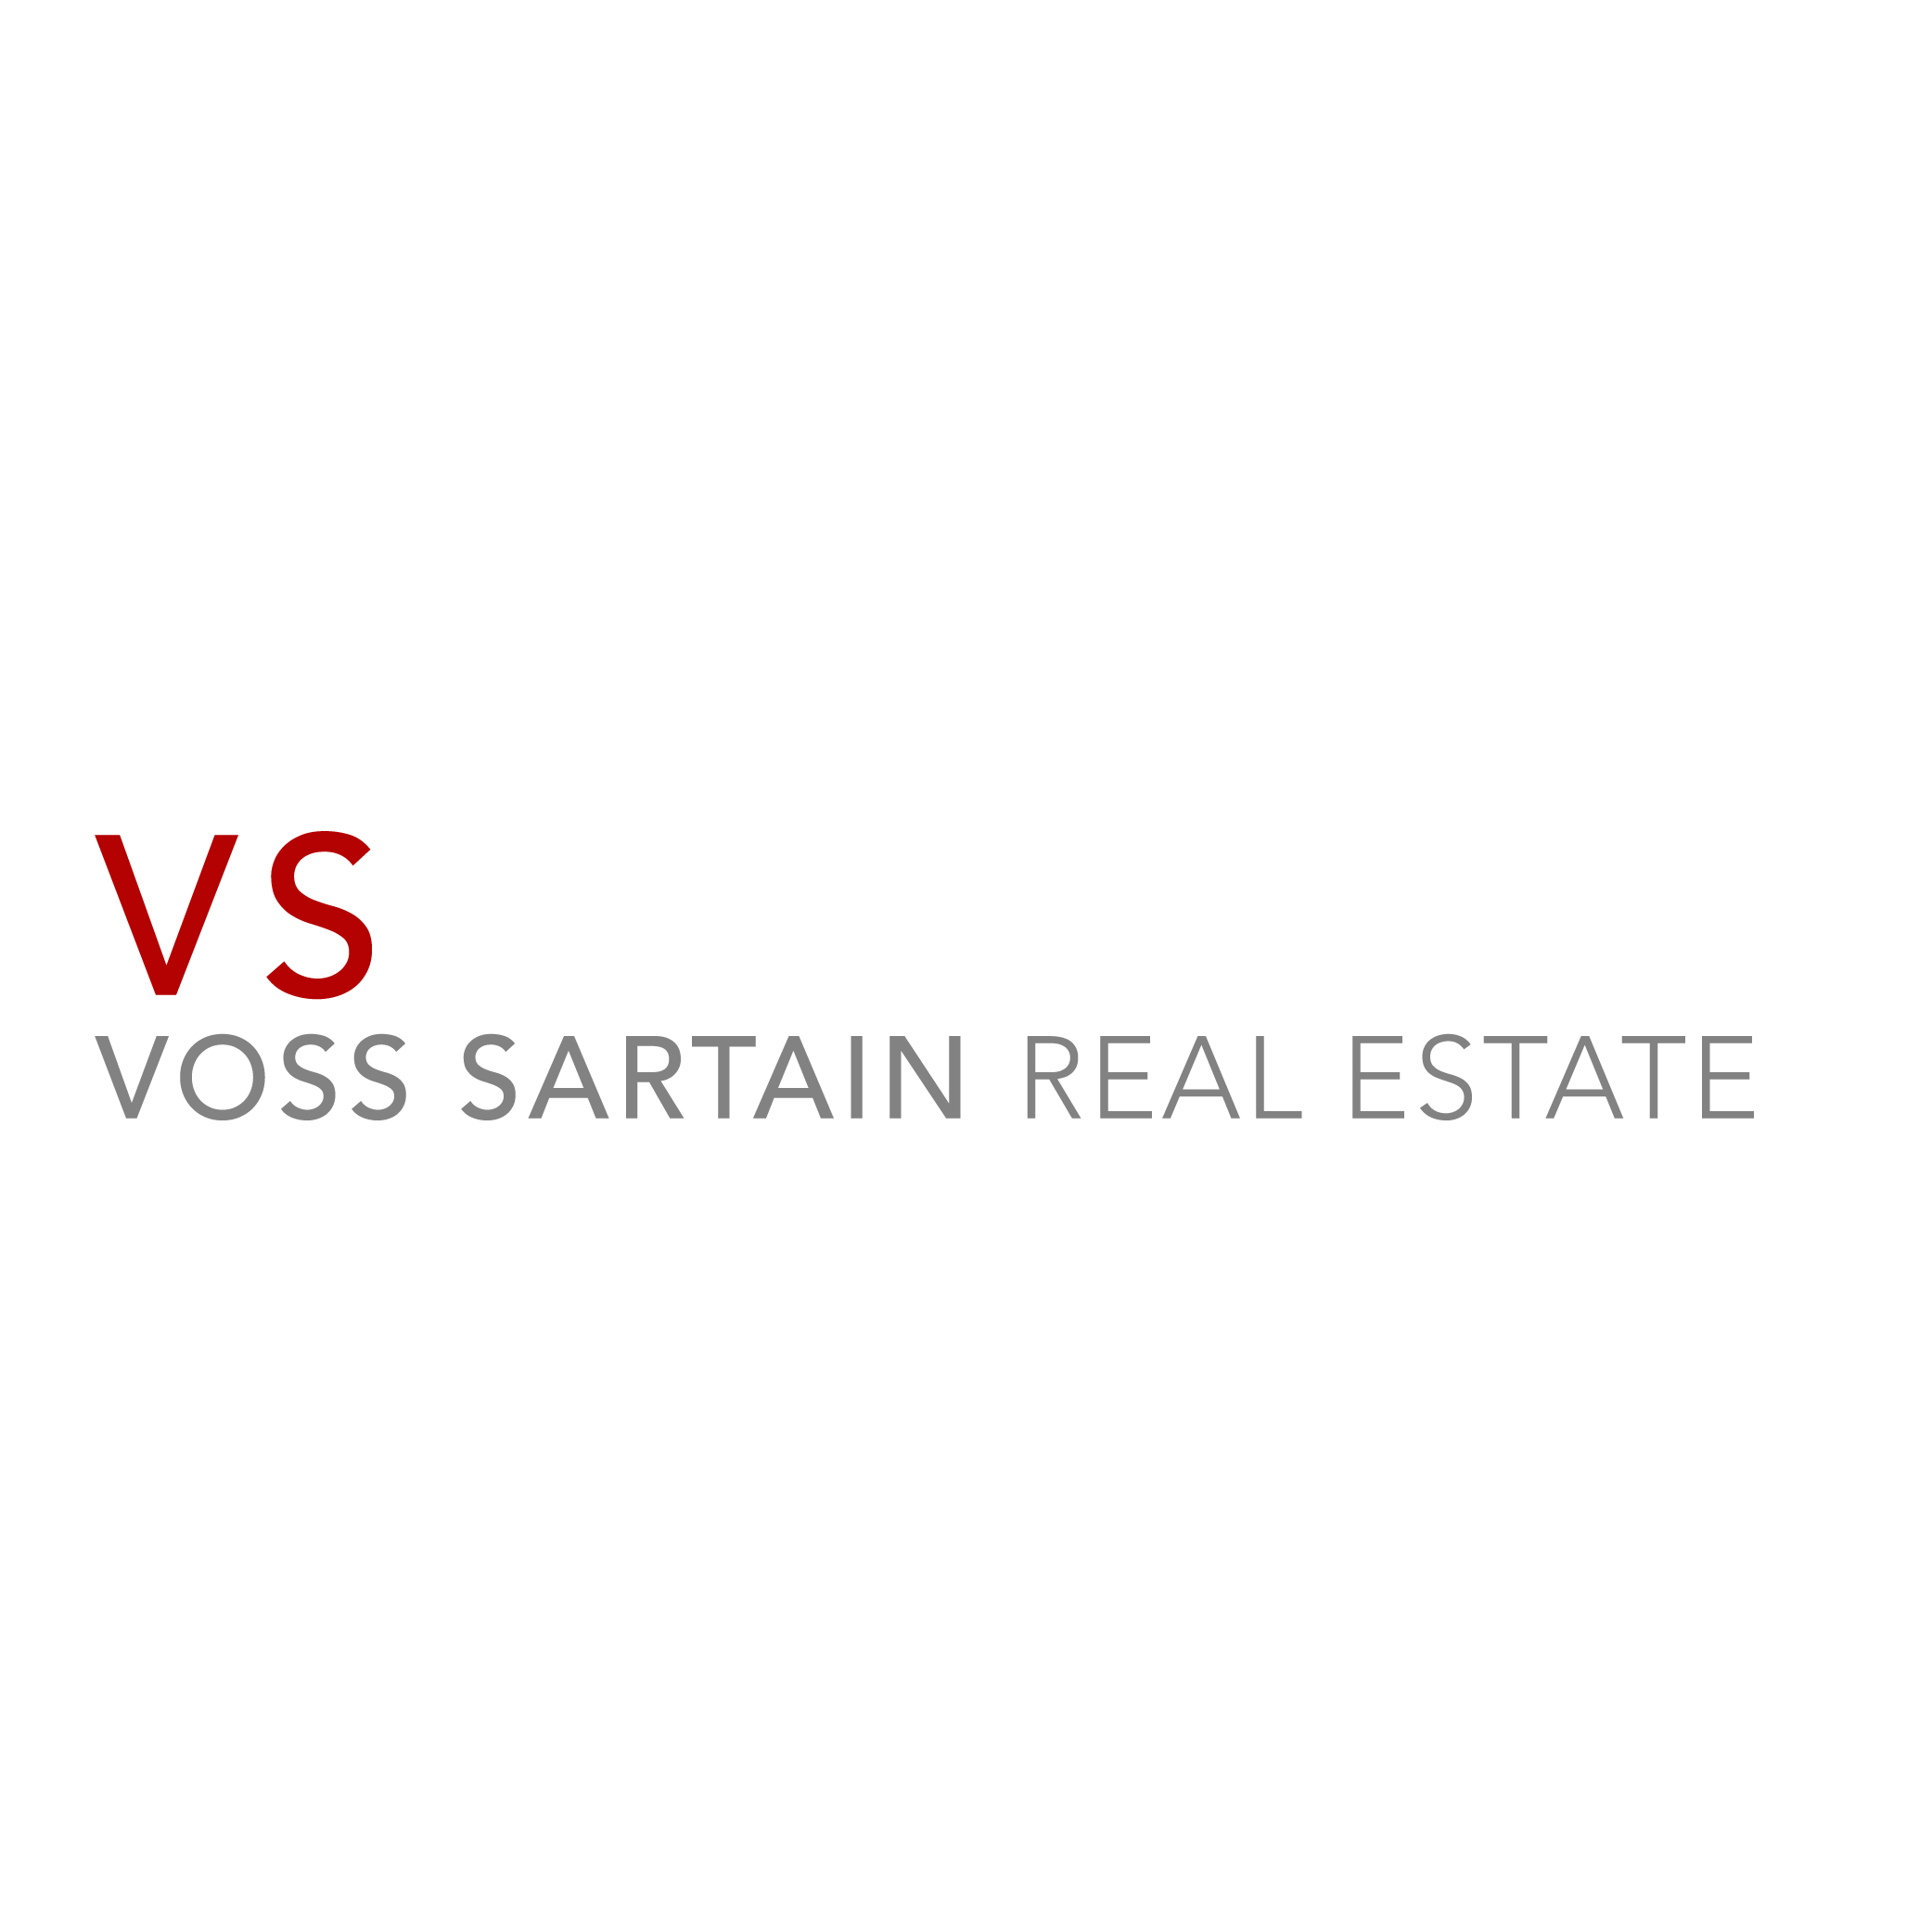 Voss Sartain Real Estate - Bozeman, MT - Real Estate Agents